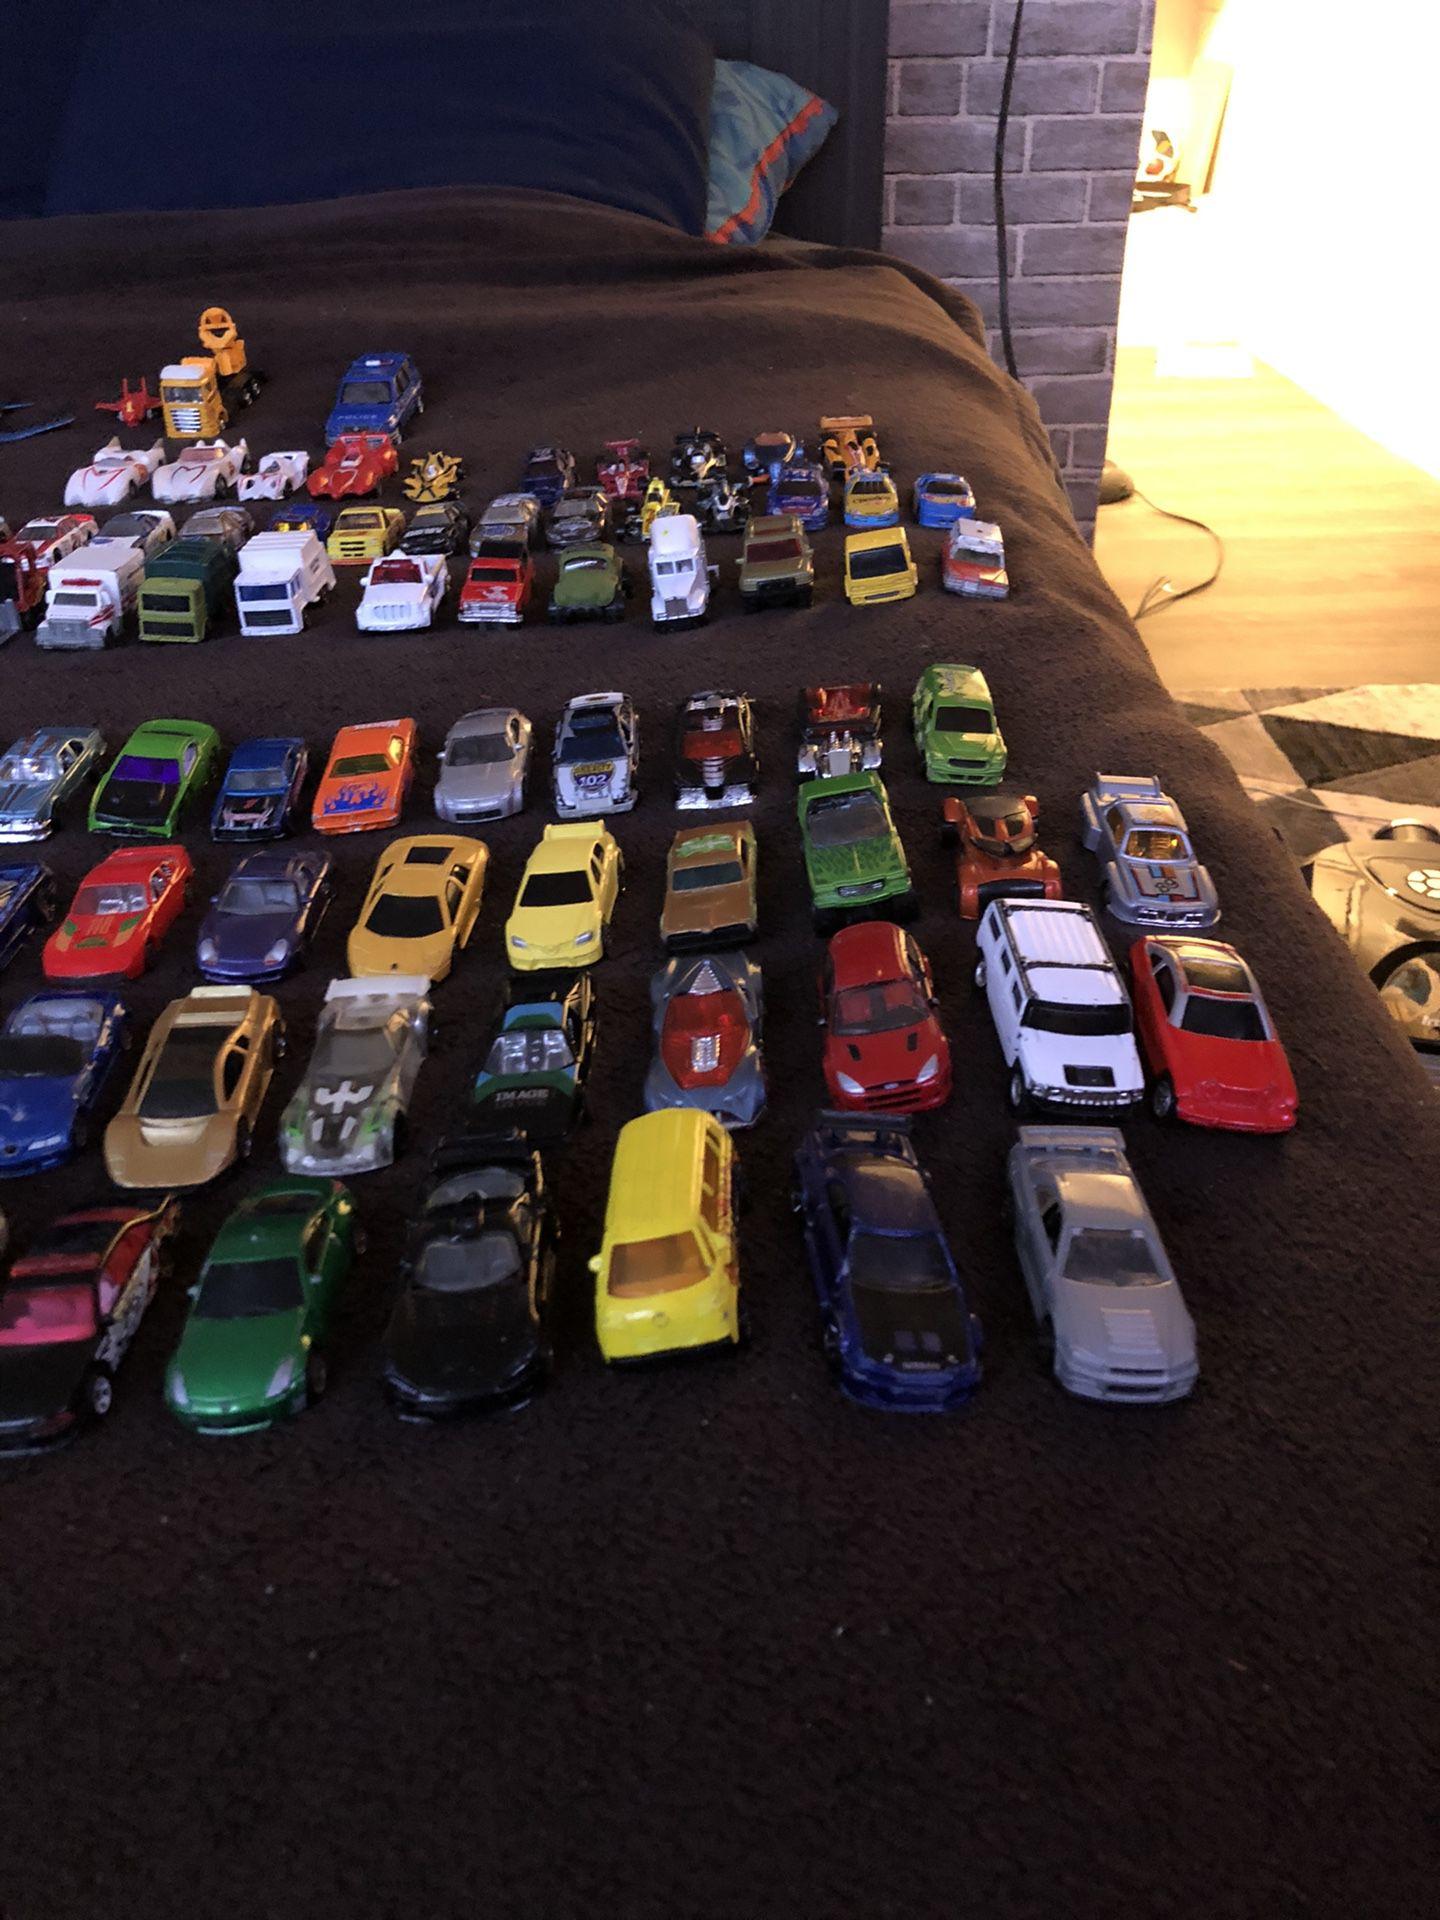 Toy cars, planes, trucks